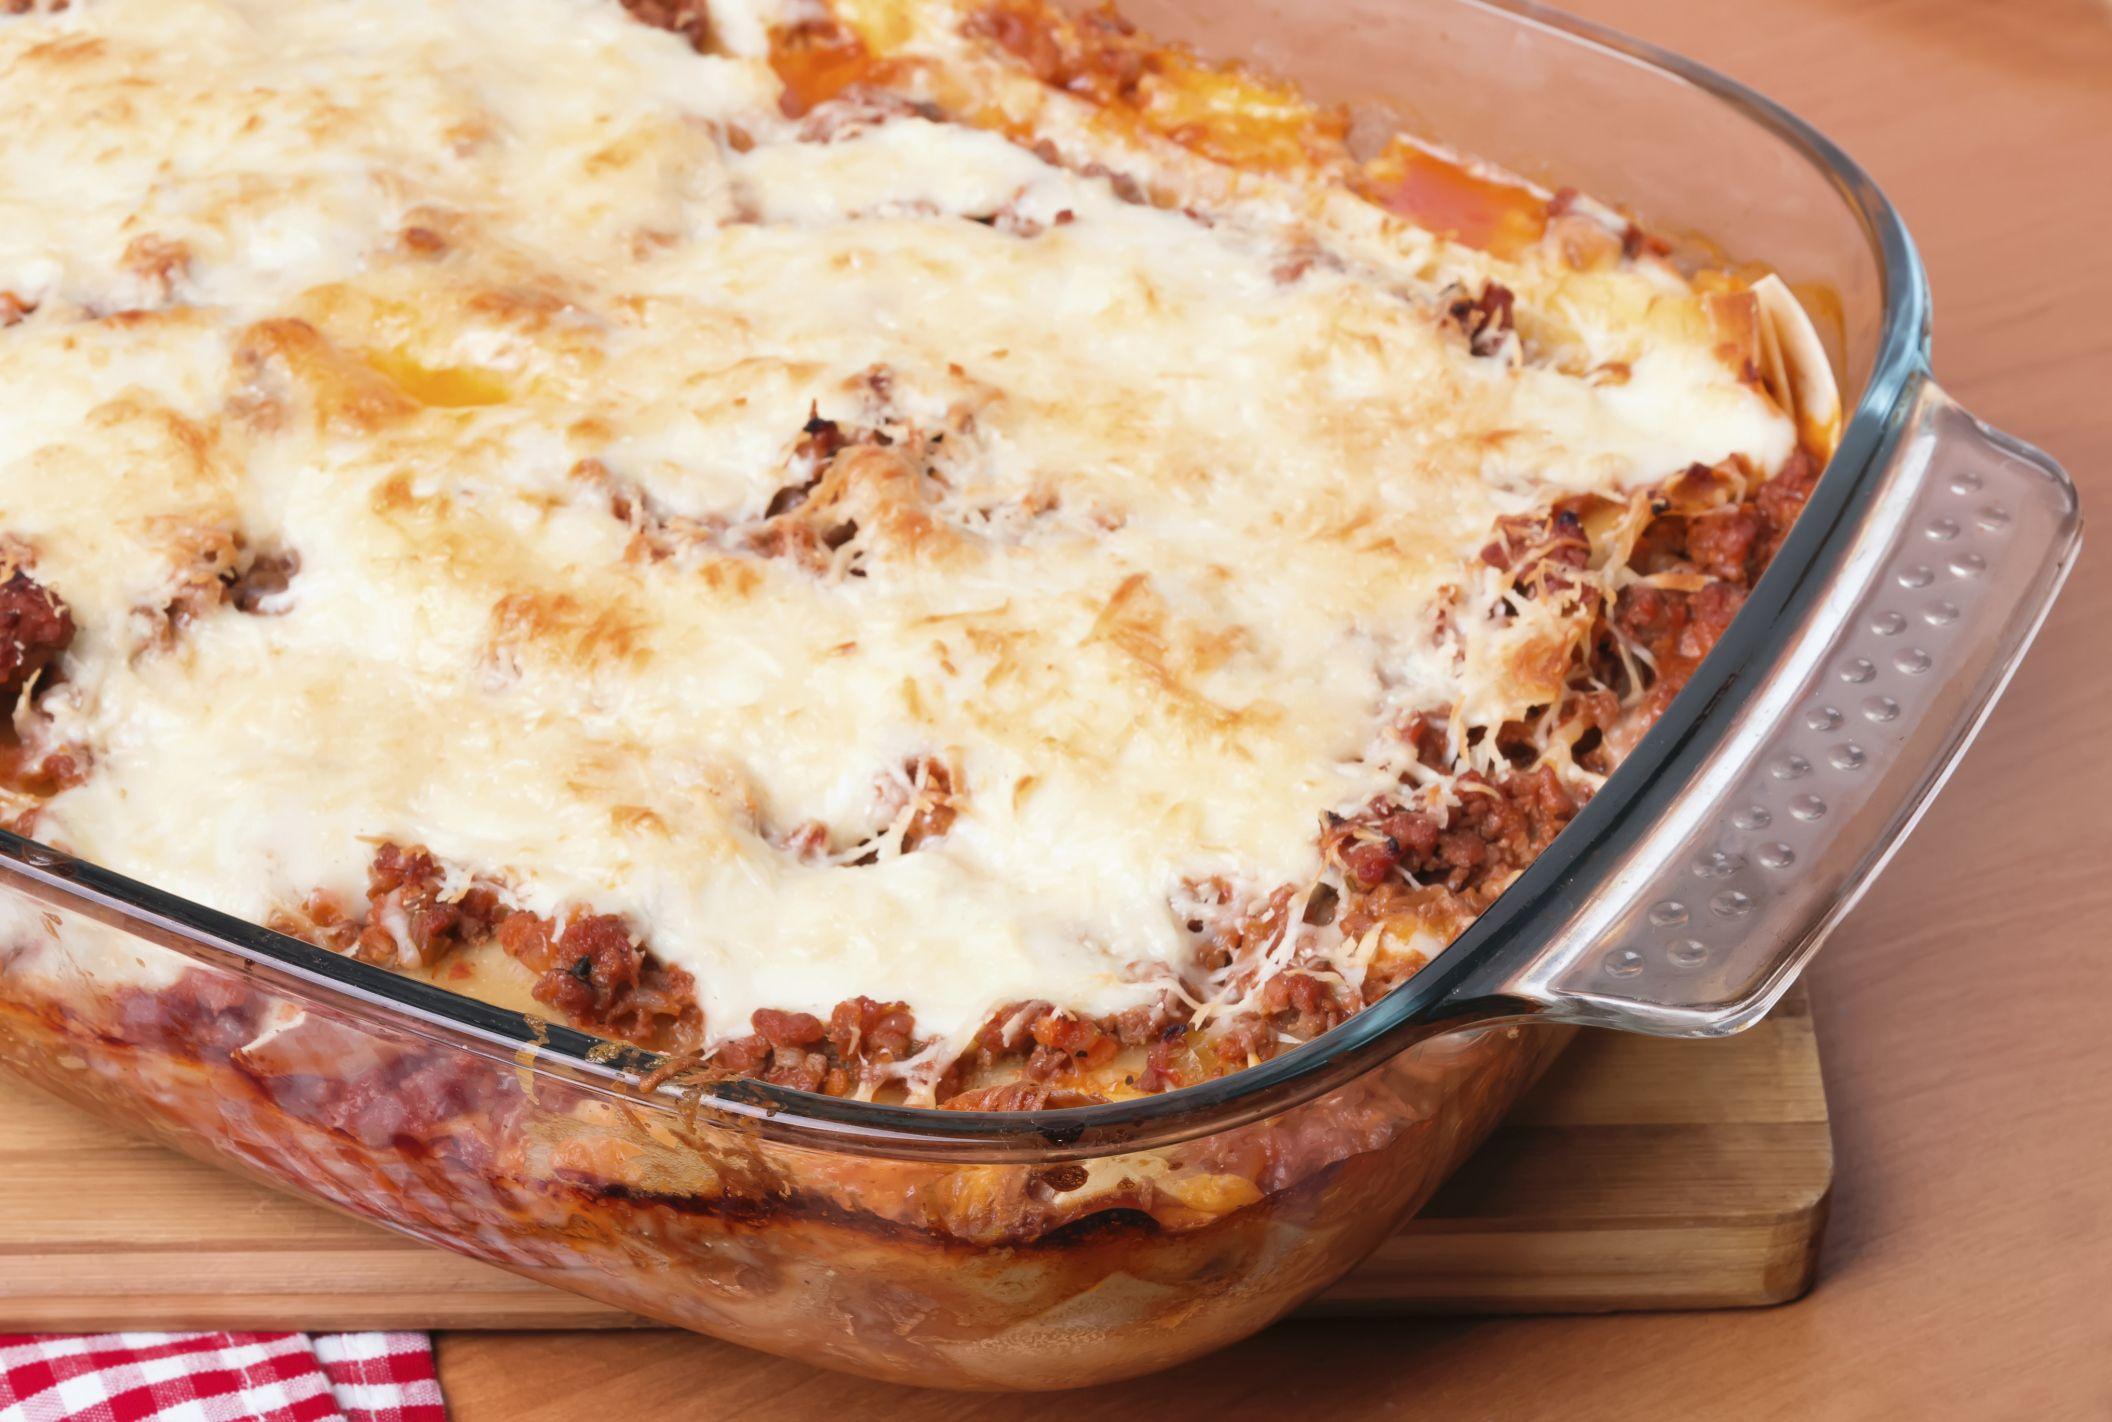 How To Reheat Frozen Lasagna Livestrong Com Reheating Frozen Lasagna Lasagna In The Oven Frozen Lasagna